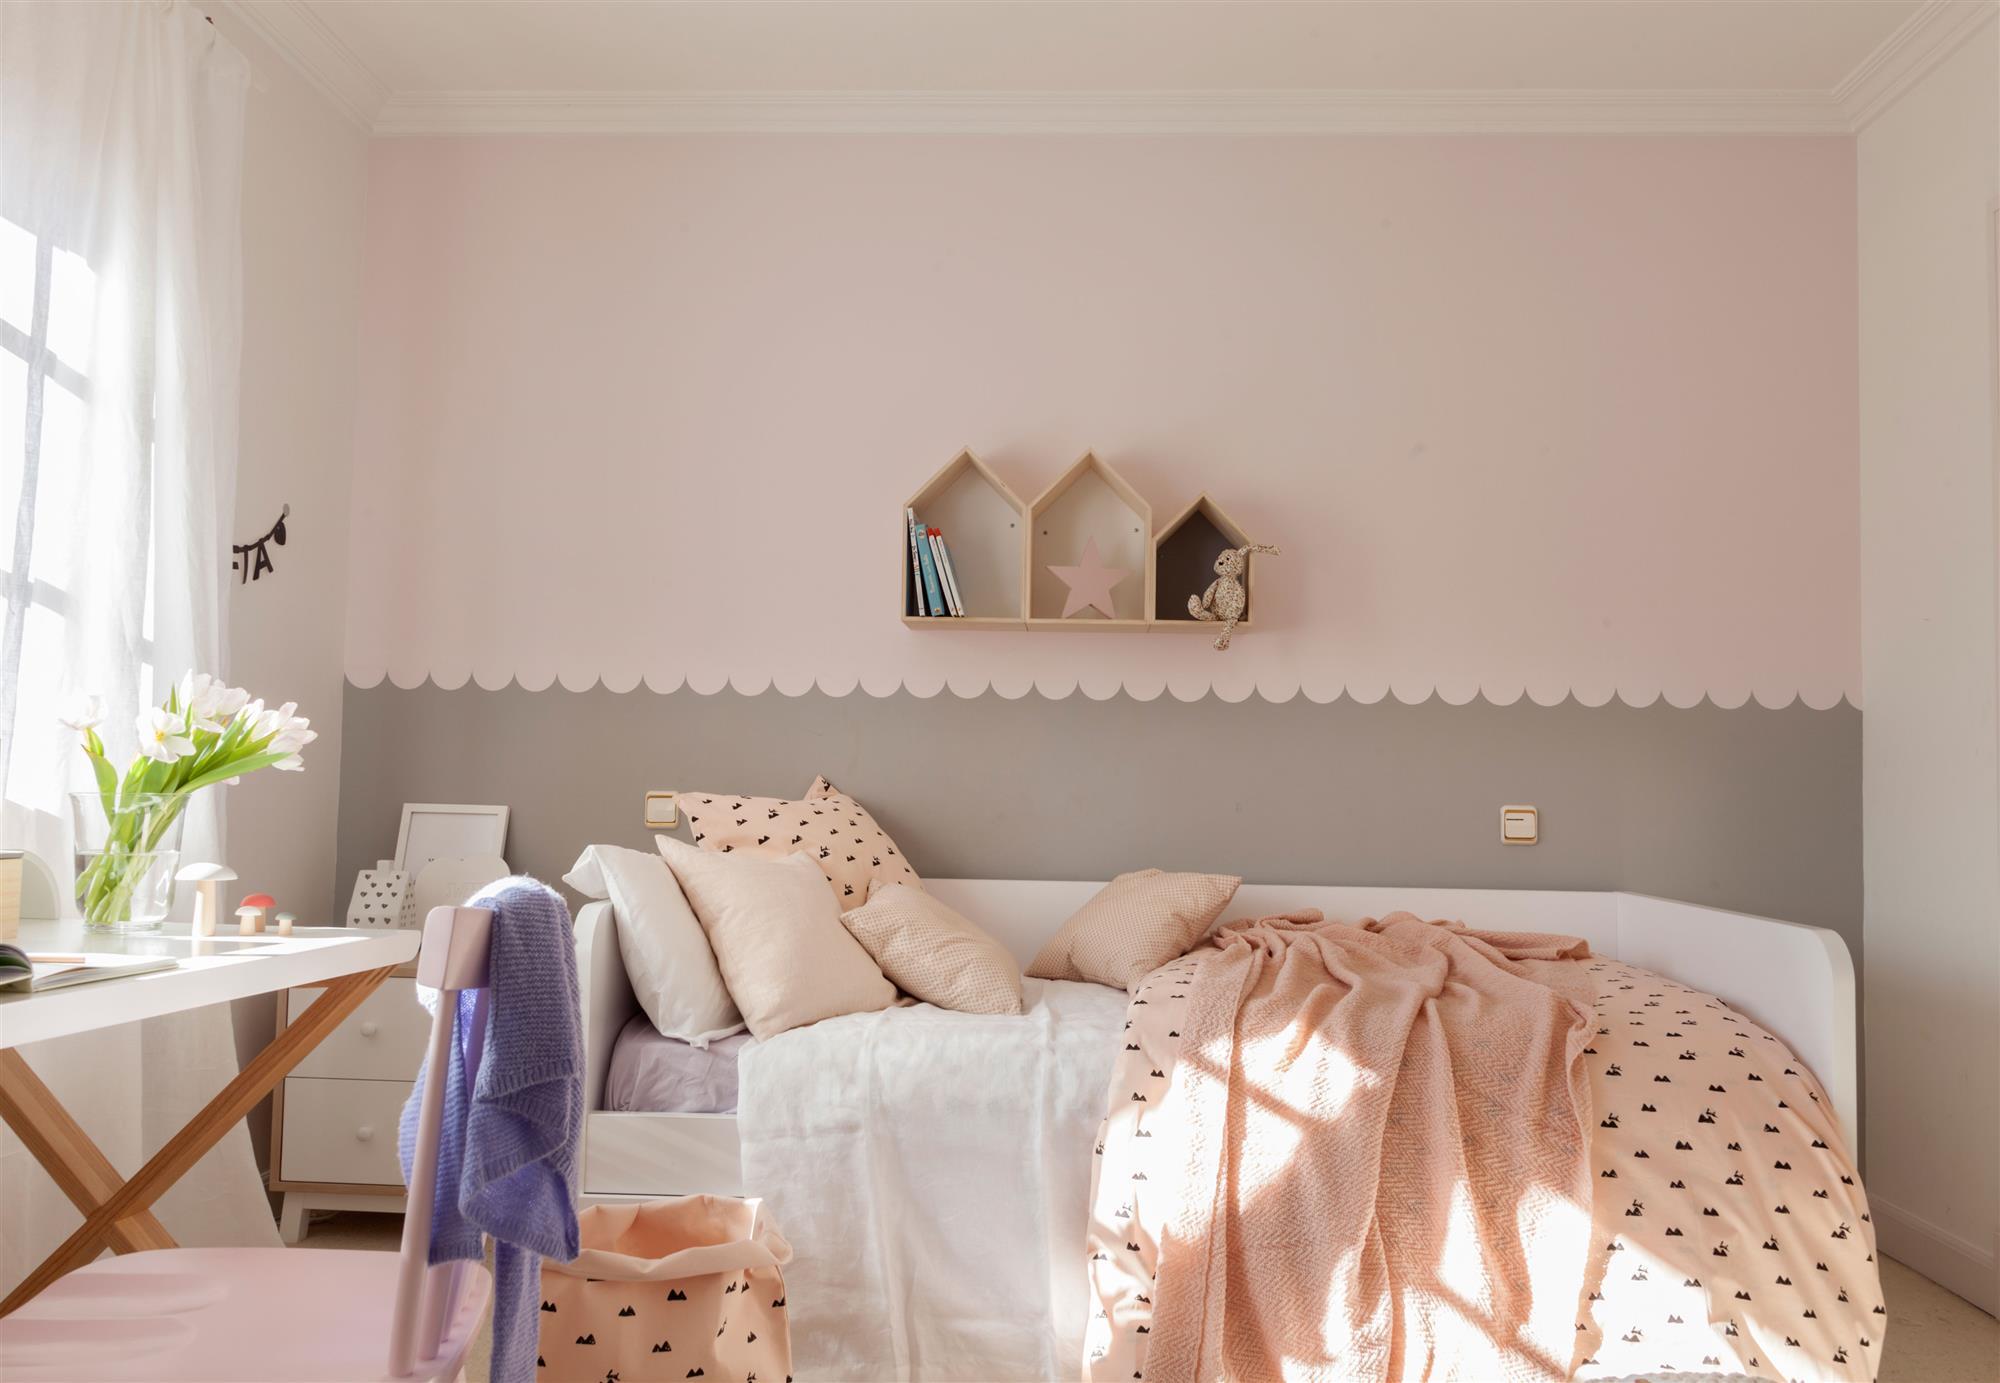 Pintar dormitorio infantil - Pintar pared dormitorio ...